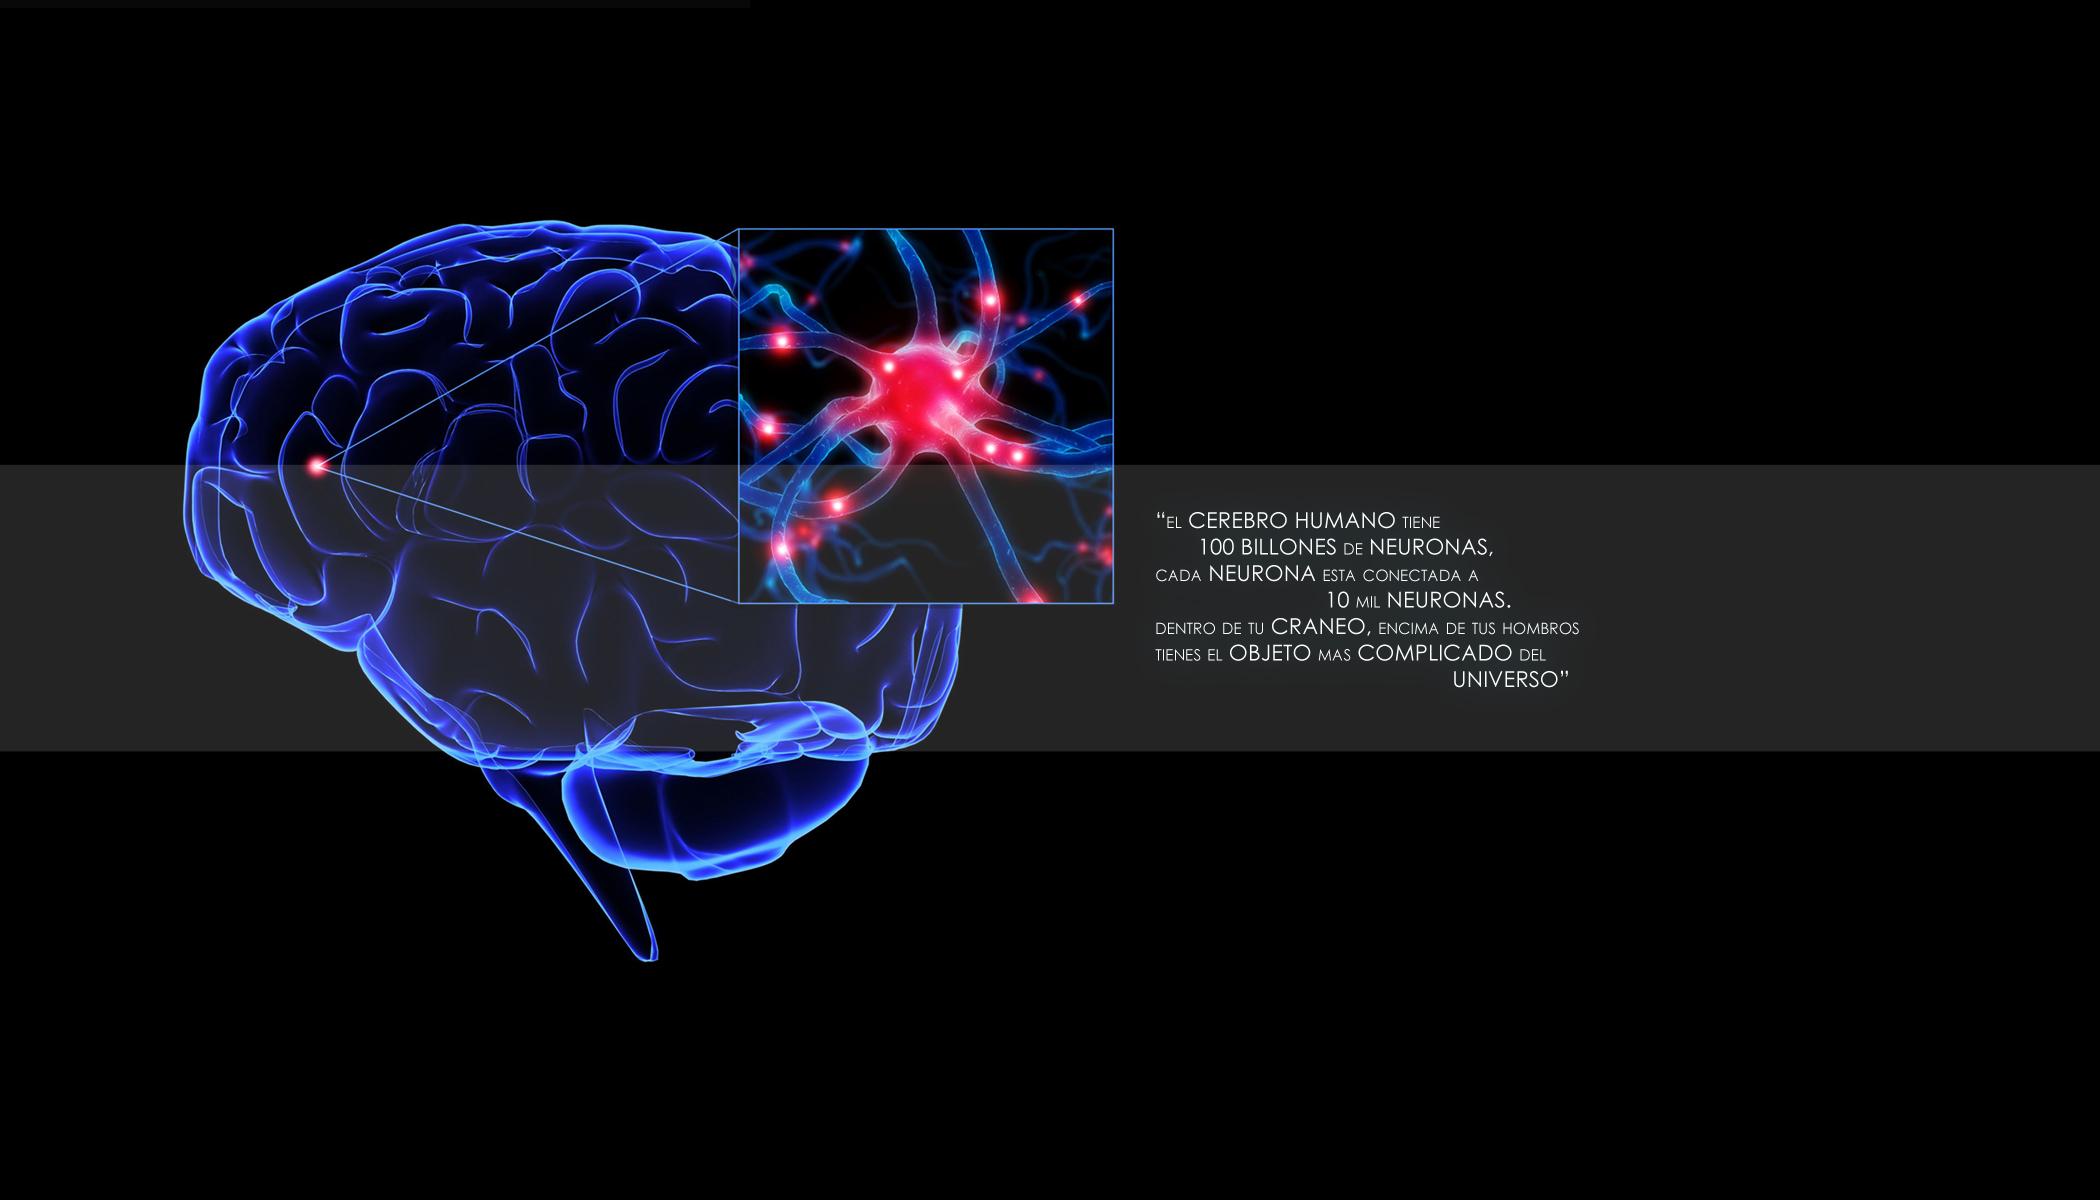 CIHC-Frontpage posters 2 WebMod fact_nologo